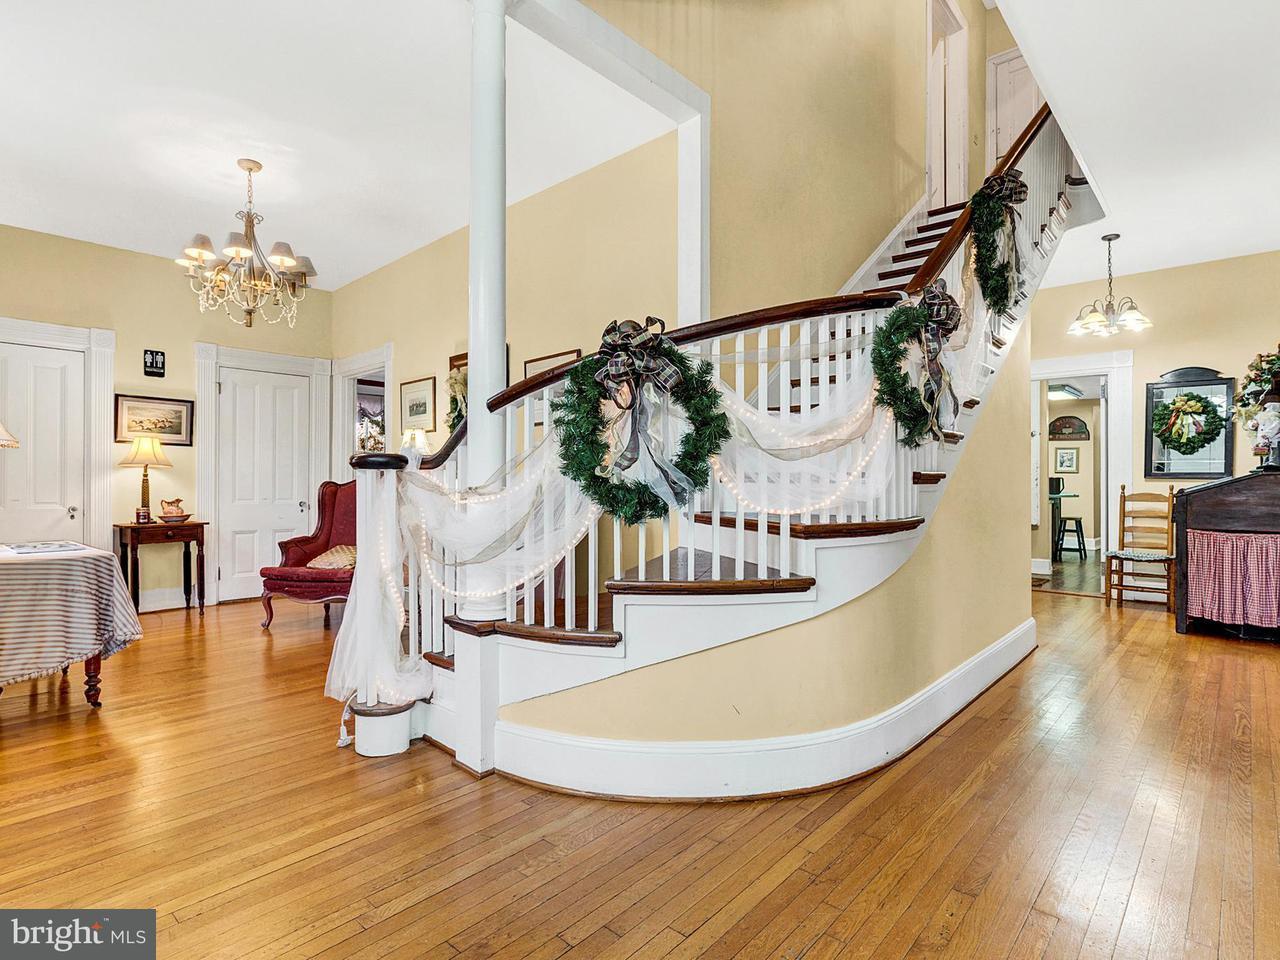 商用 為 出售 在 511 Falmouth Street 511 Falmouth Street Warrenton, 弗吉尼亞州 20186 美國